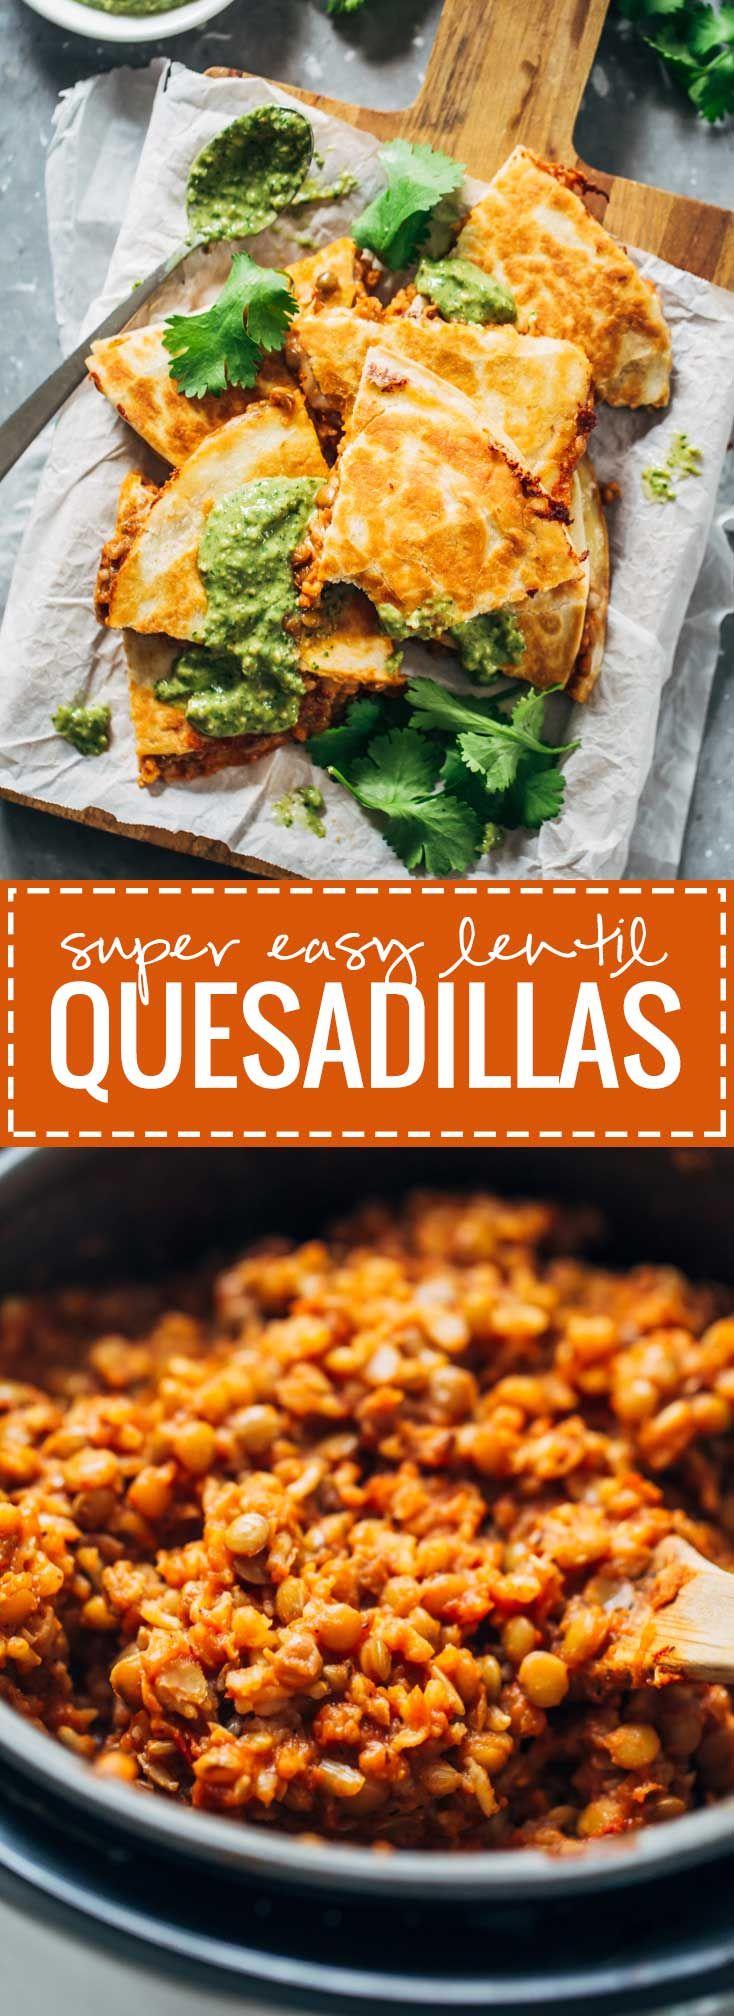 Quick and Easy Lentil Quesadillas - vegetarian comfort food! | pinchofyum.com